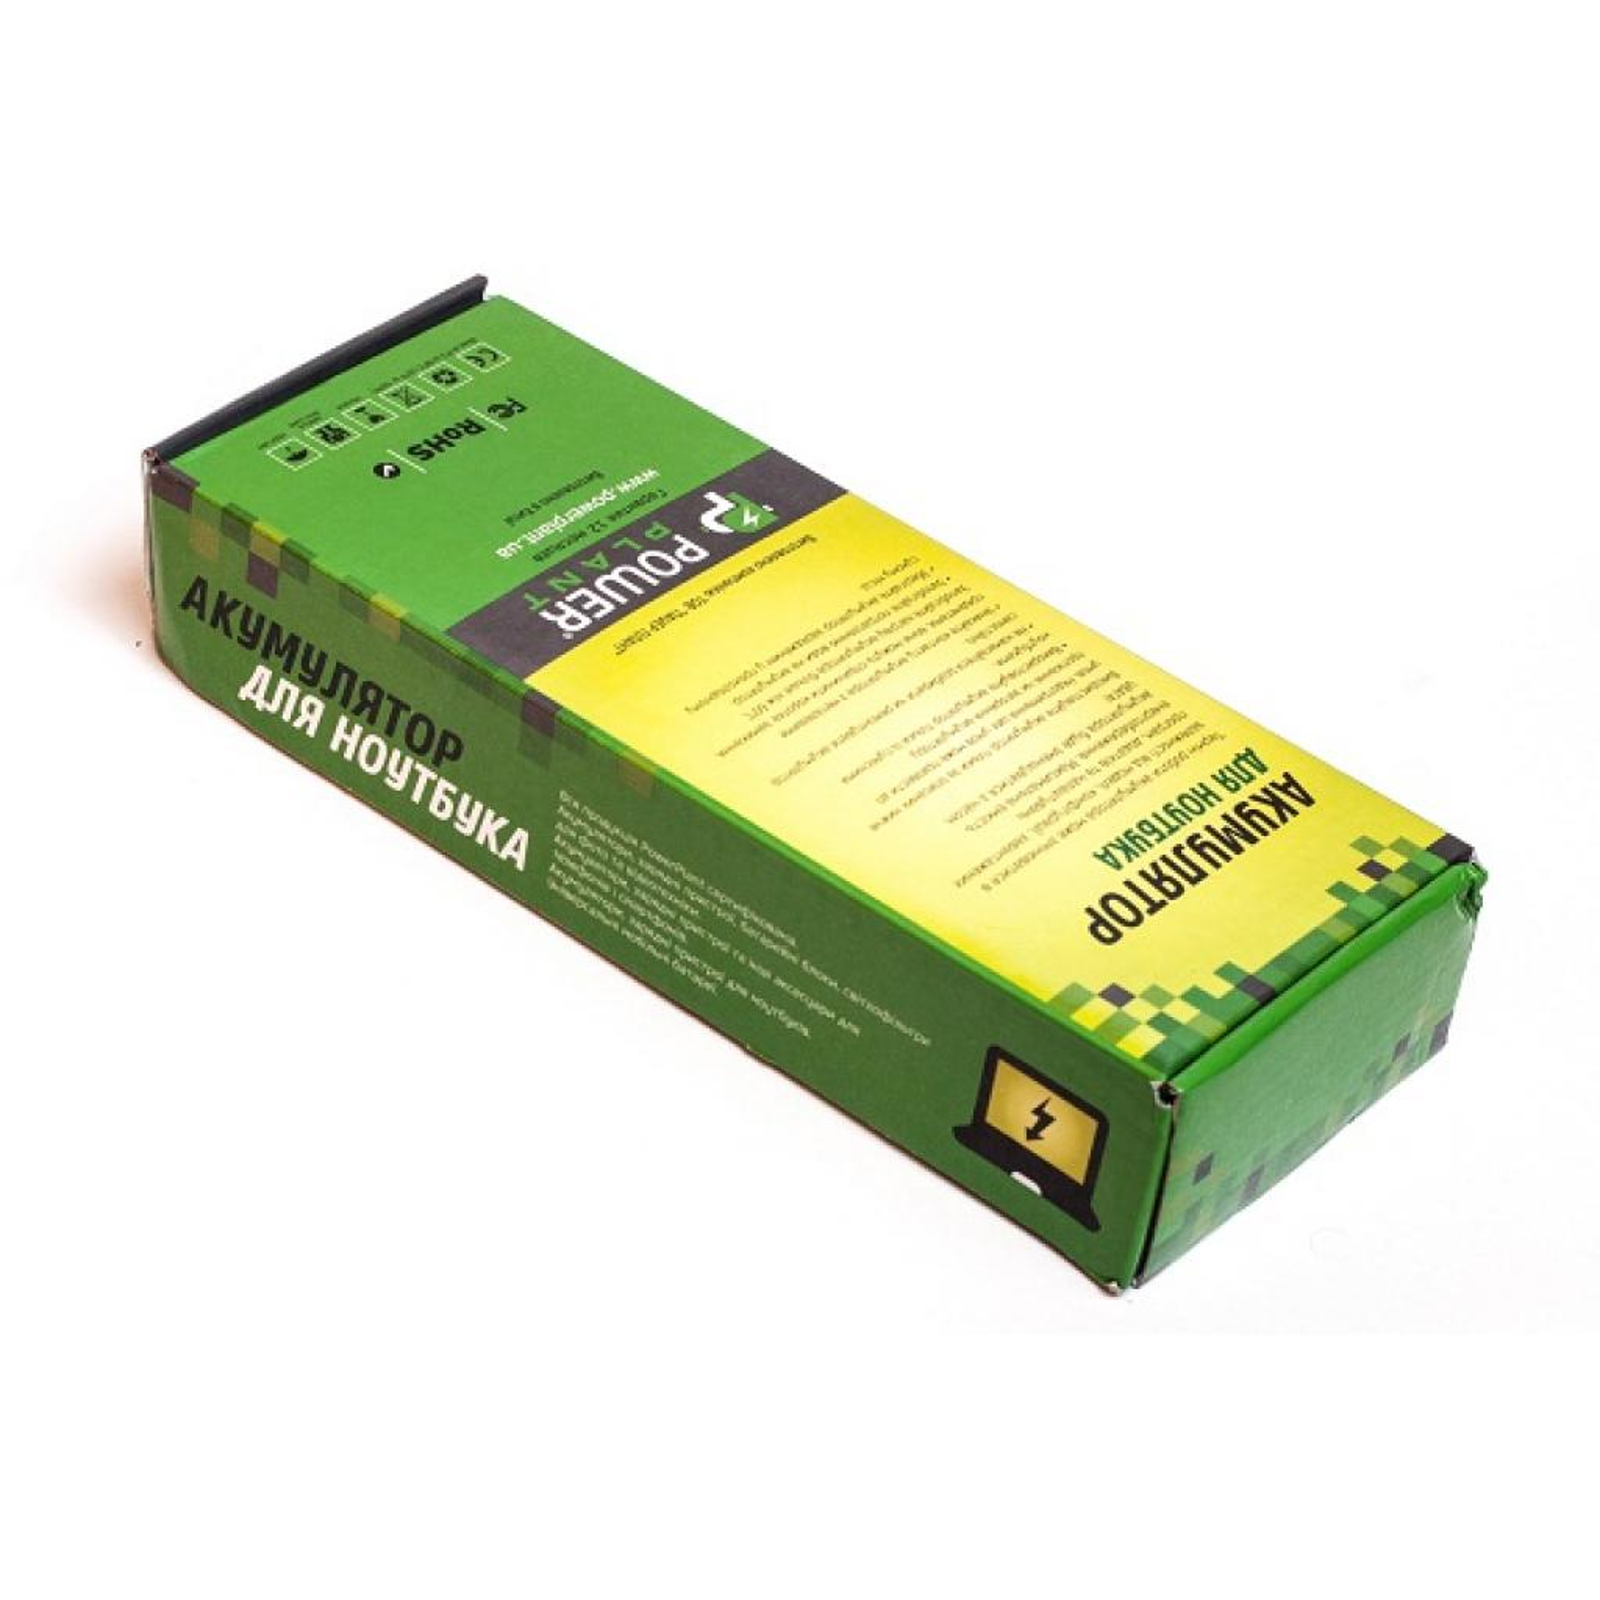 Аккумулятор для ноутбука HP Business 6431S (HSTNN-DB51, H65203S2P) 10.8V 5200mAh PowerPlant (NB00000129) изображение 2